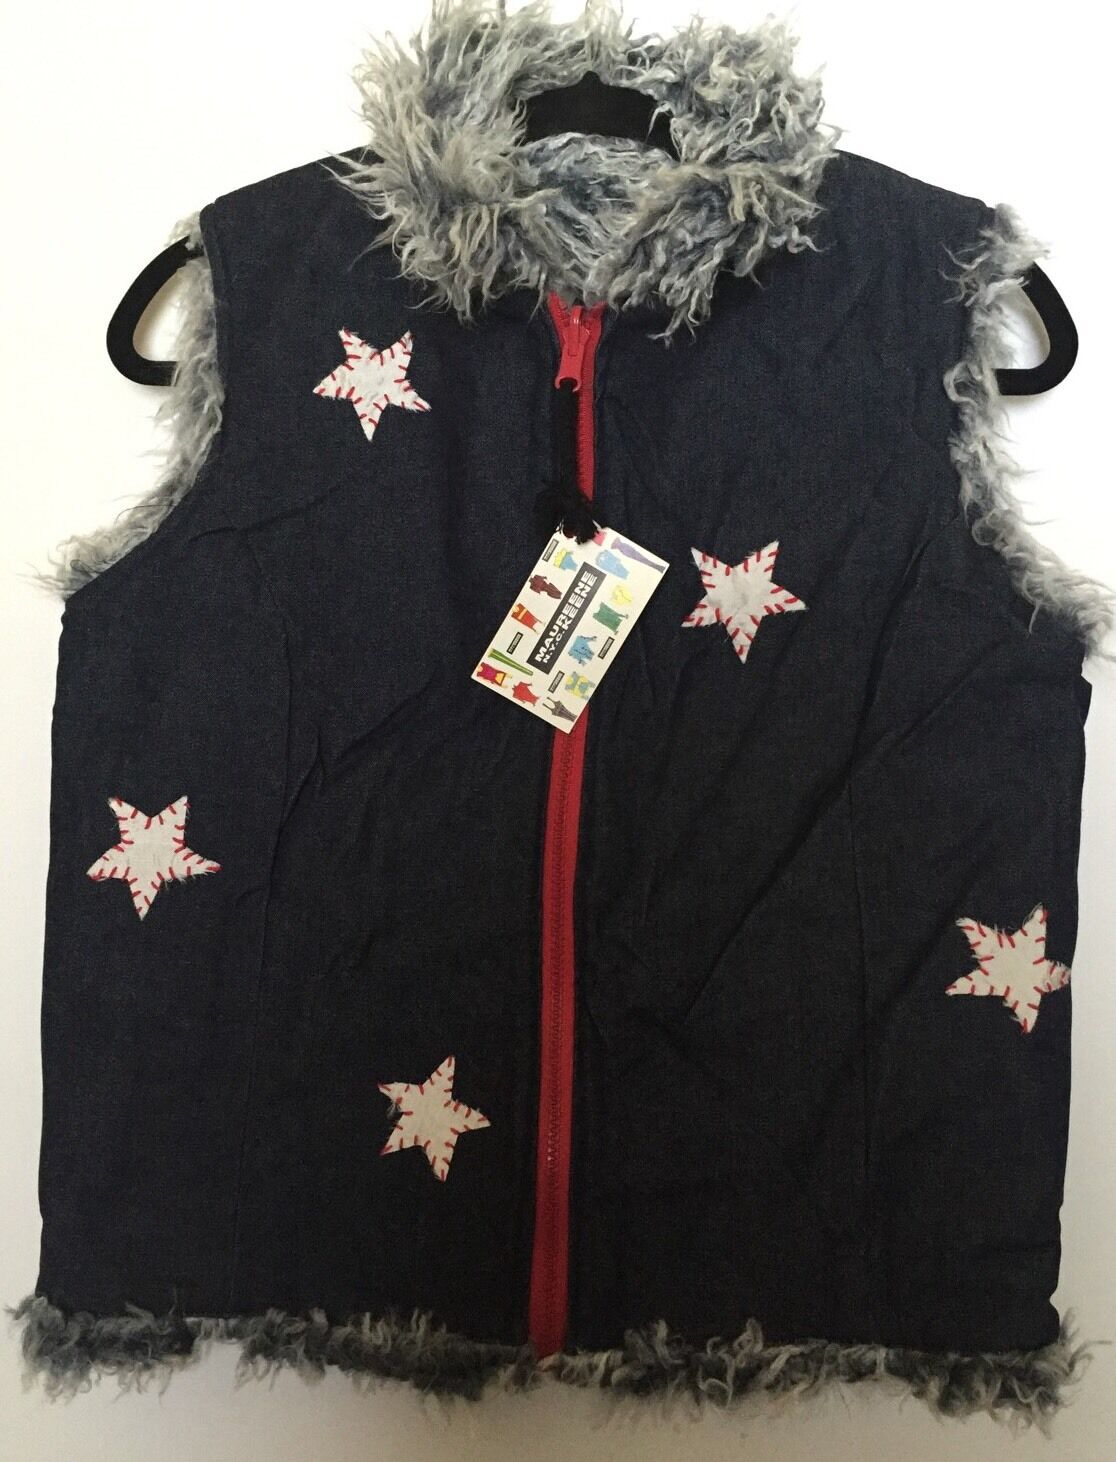 NEW Maureene Keene NYC Reversible Vest Vest Vest July 4 HTF Silk ShagFur NWT S Small Stars c7f8ba